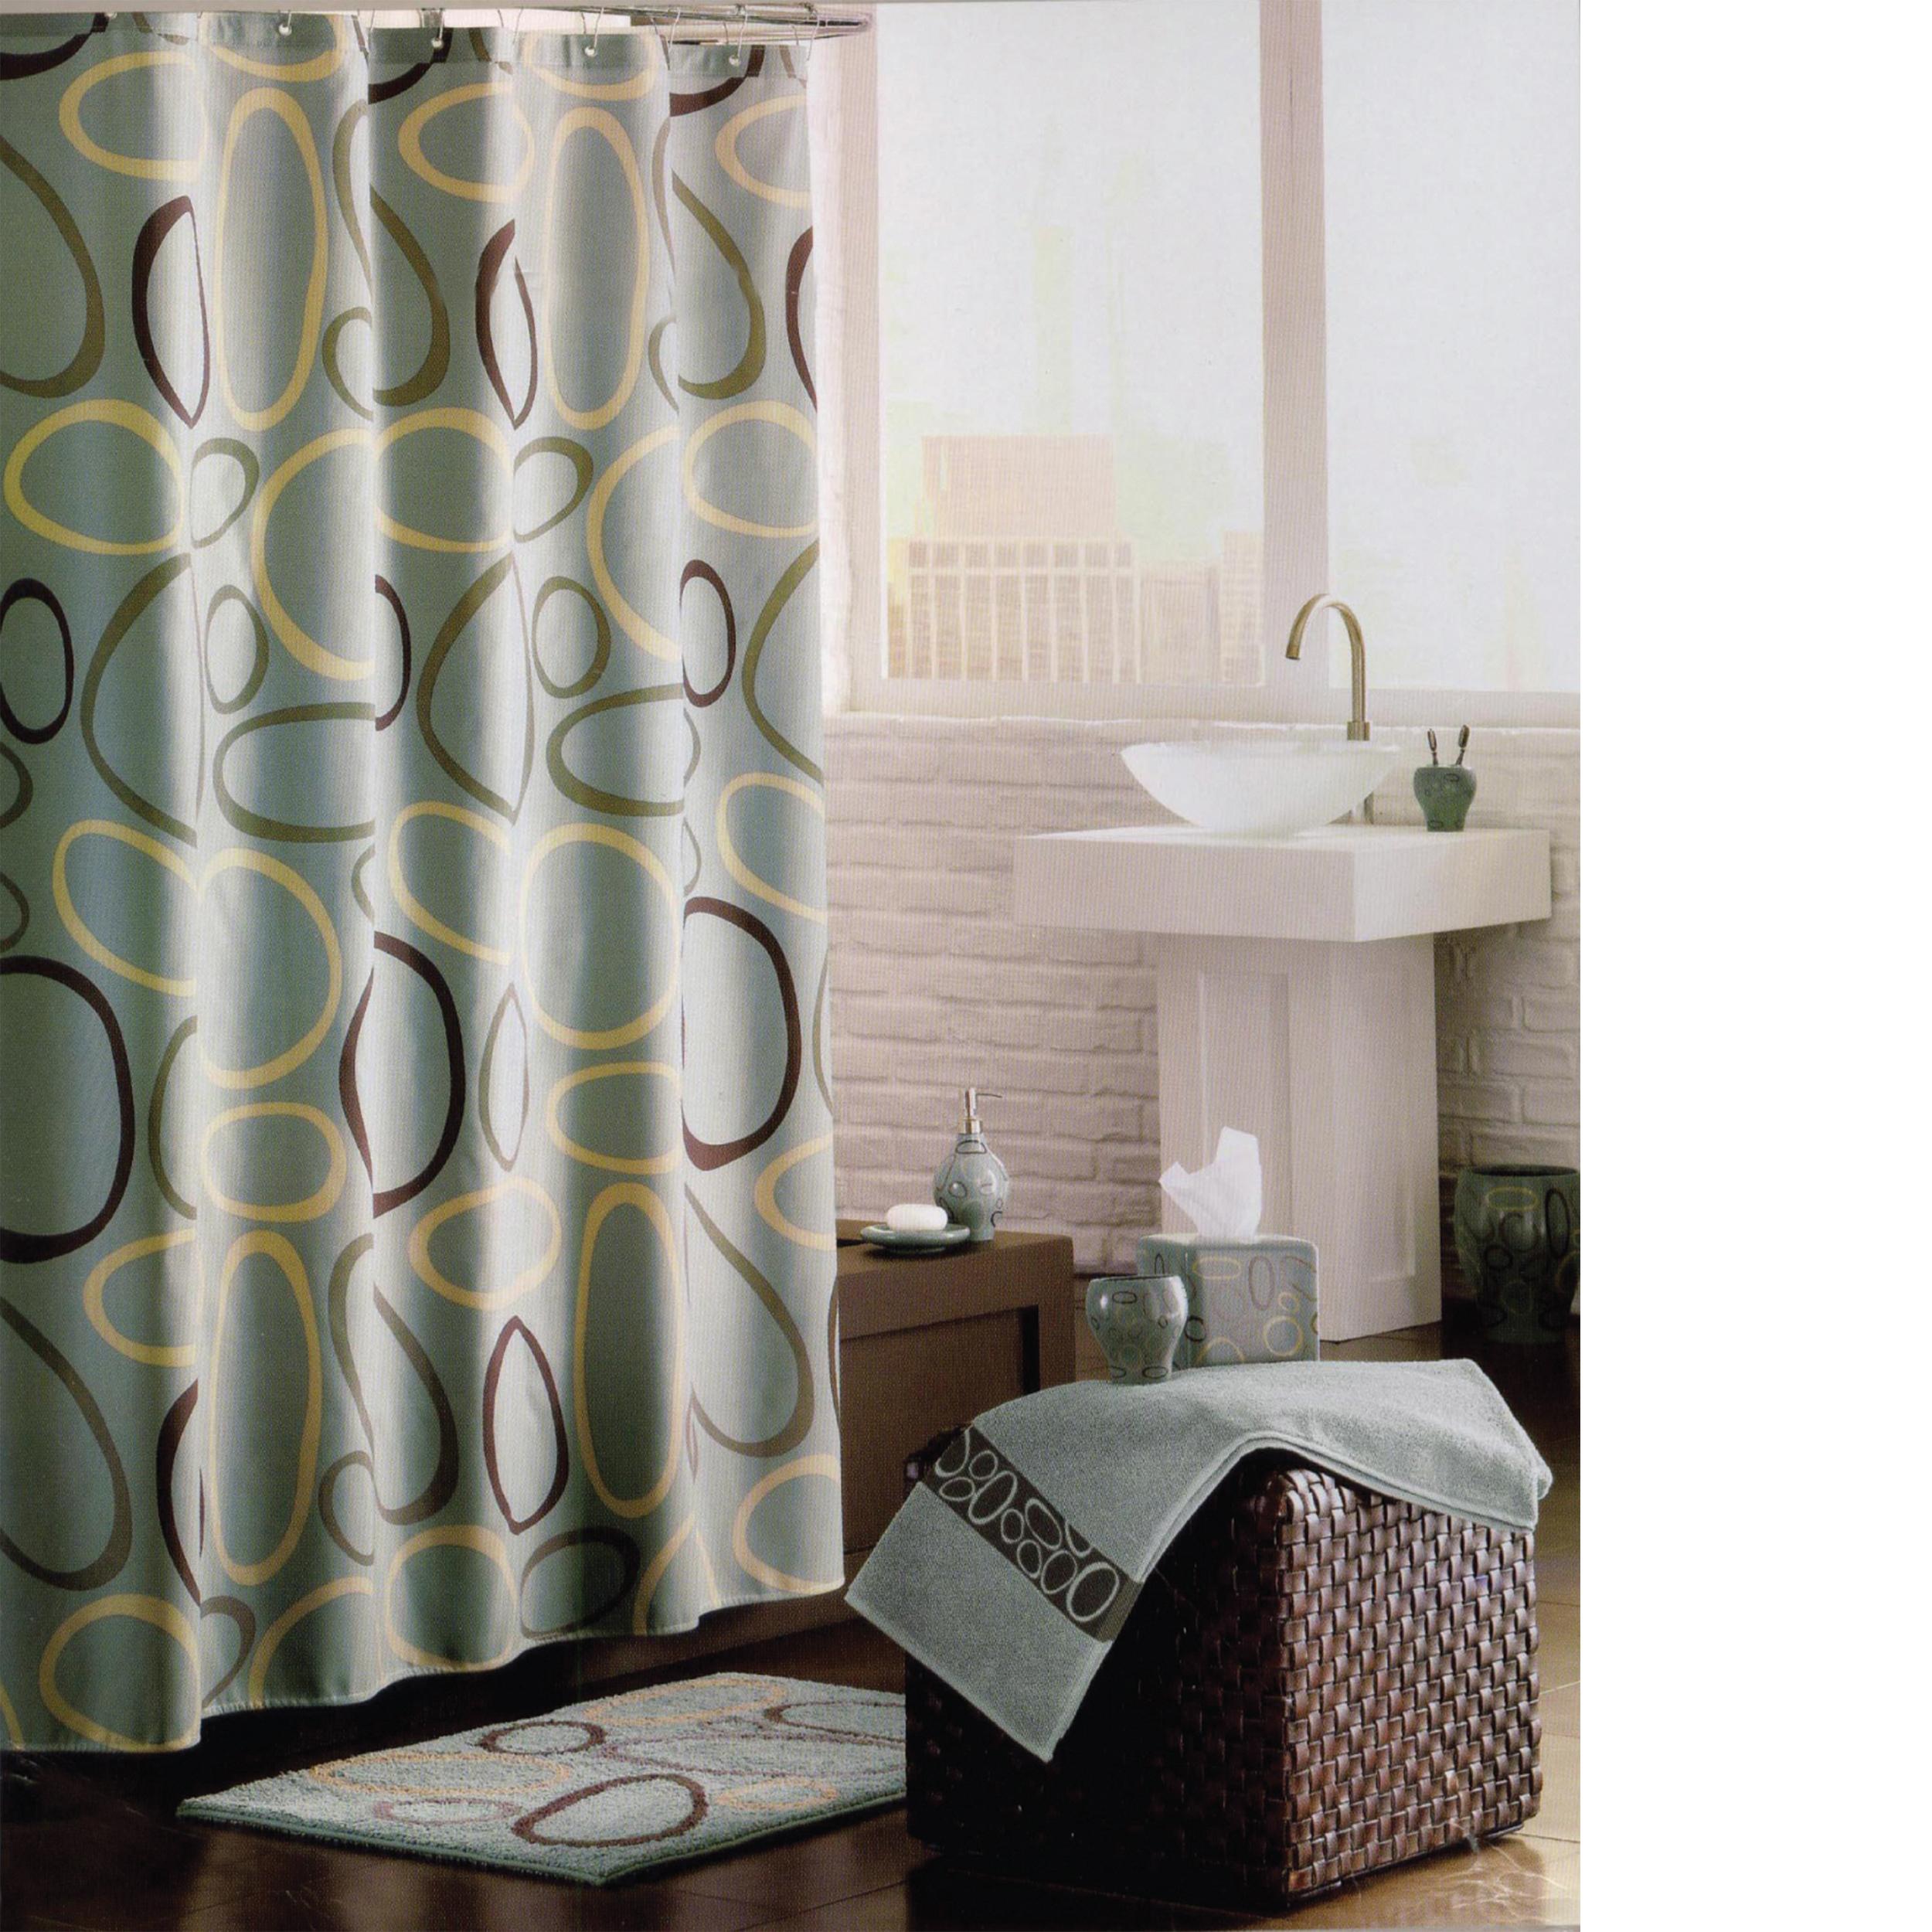 MSV Duschvorhang 180x200cm Anti Schimmel Textil Badewannenvorhang Wannenvorhang Ovale